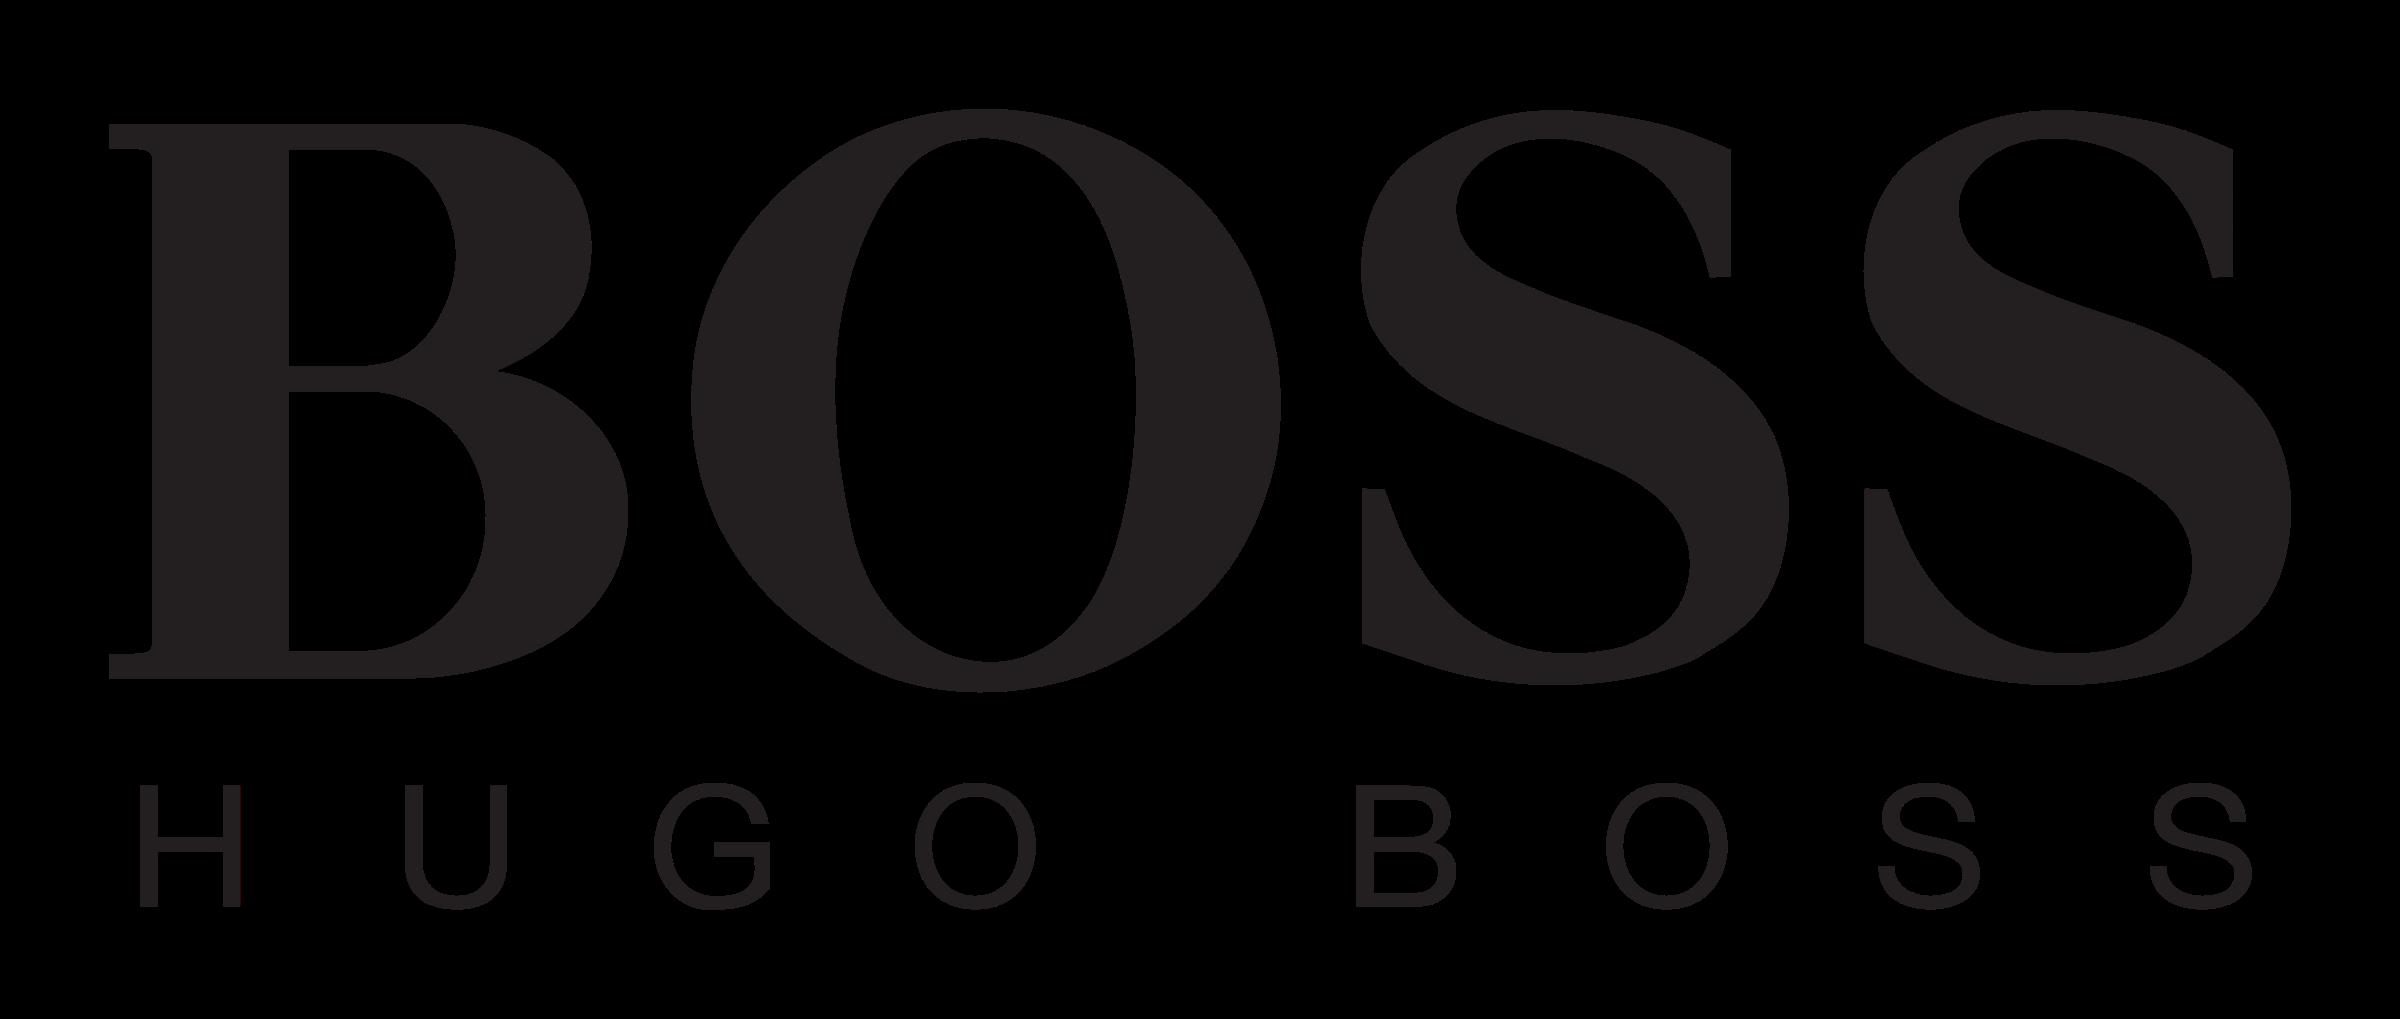 Hugo Boss PNG - 98537